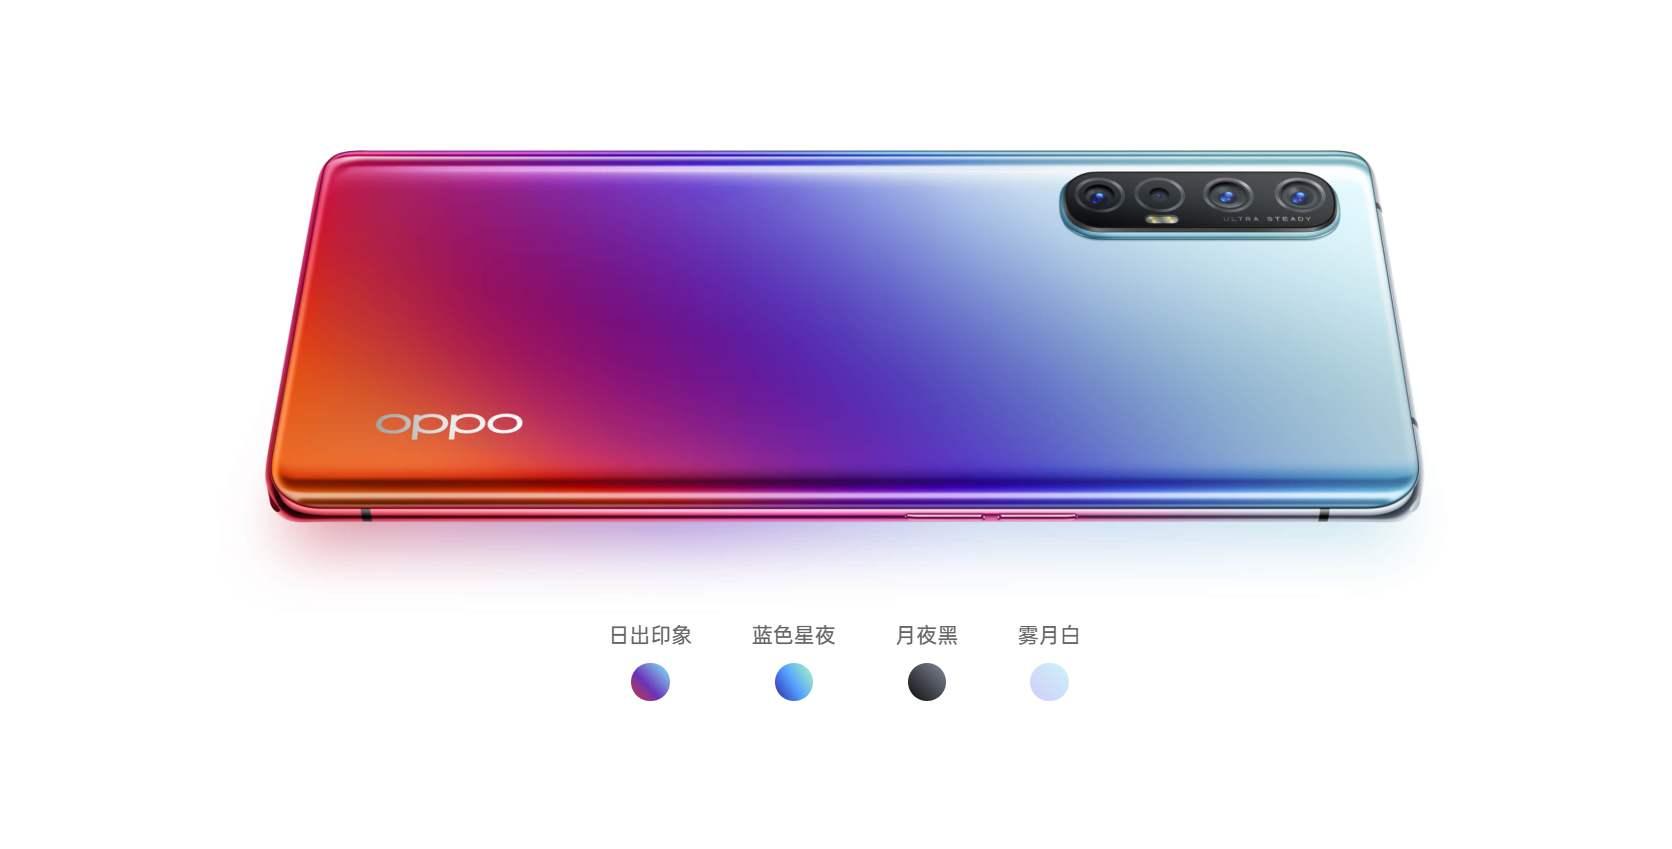 opporeno3pro支持无线充电吗?有红外功能吗?